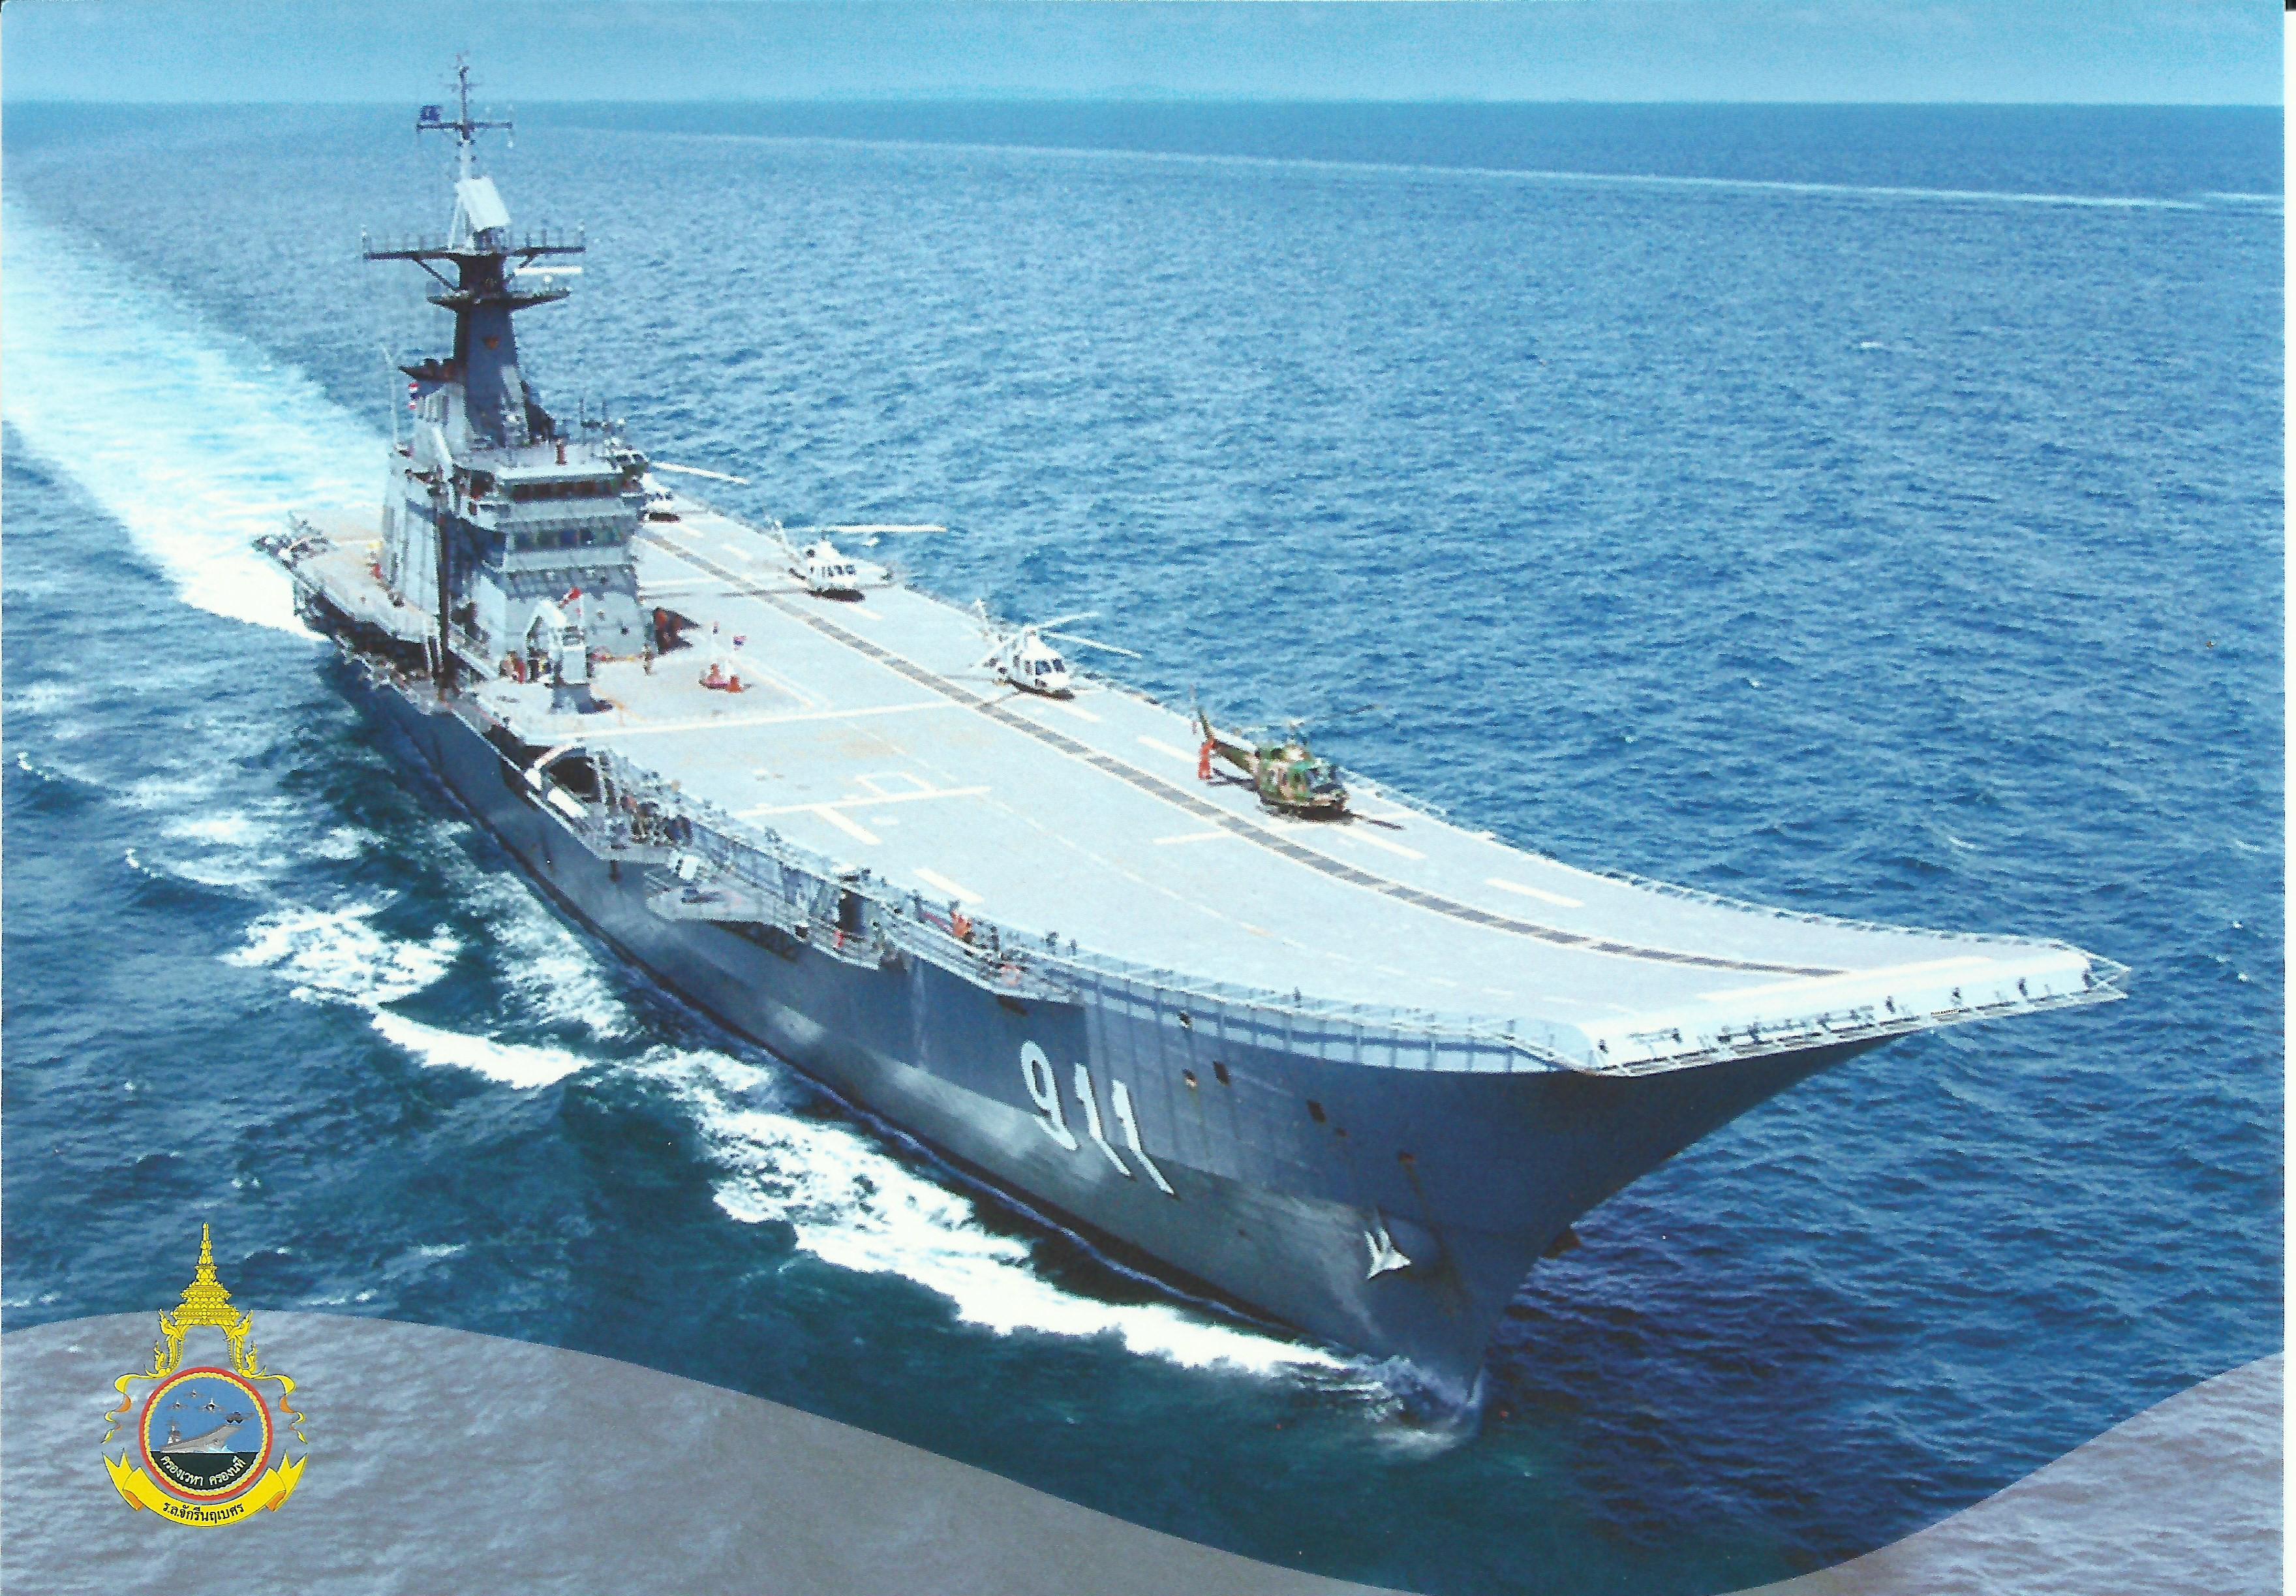 Thailand - Royal Thai Navy HTMS Chakri Naruebet pre-paid postal card #2 - 2014